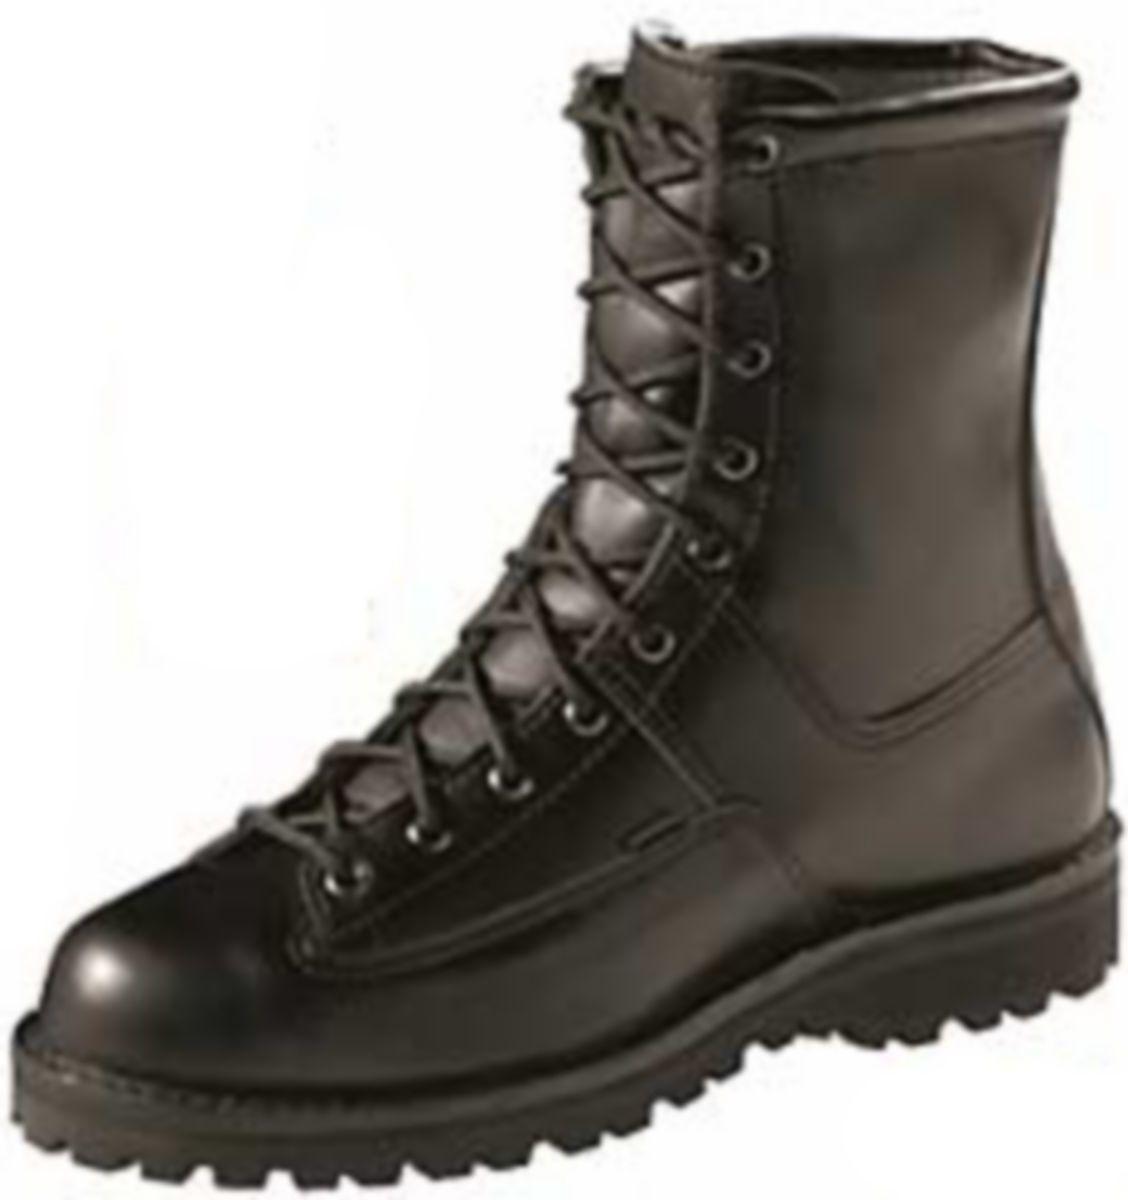 Danner® Recon 200-Gram GORE-TEX® Boots